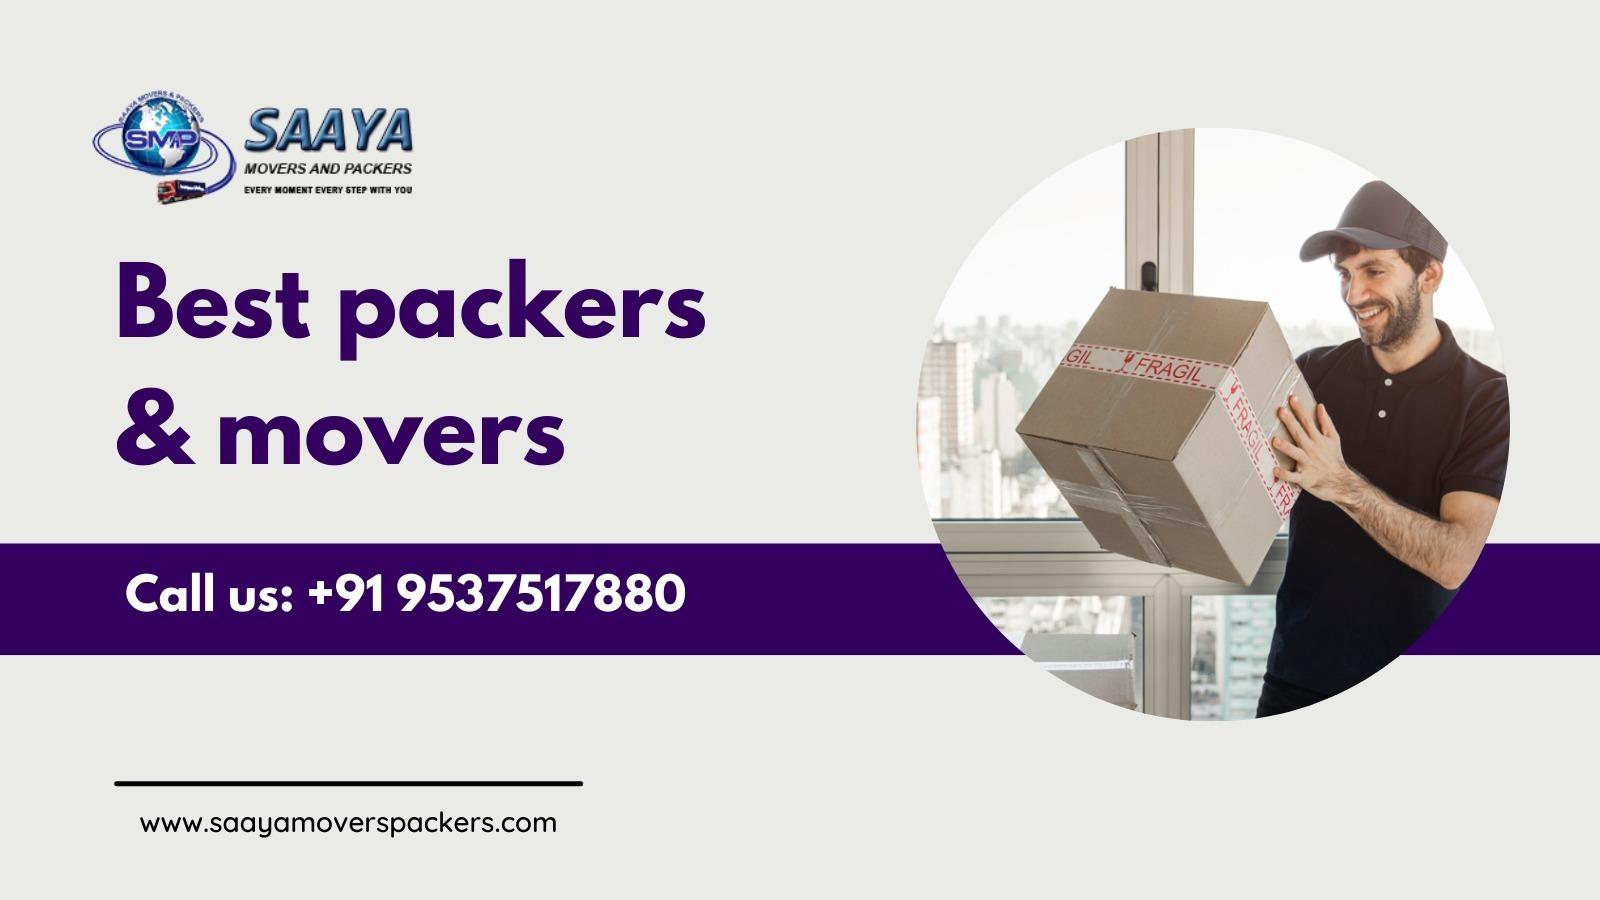 saayamoversandpackers (@saayamoversandpackers) Cover Image